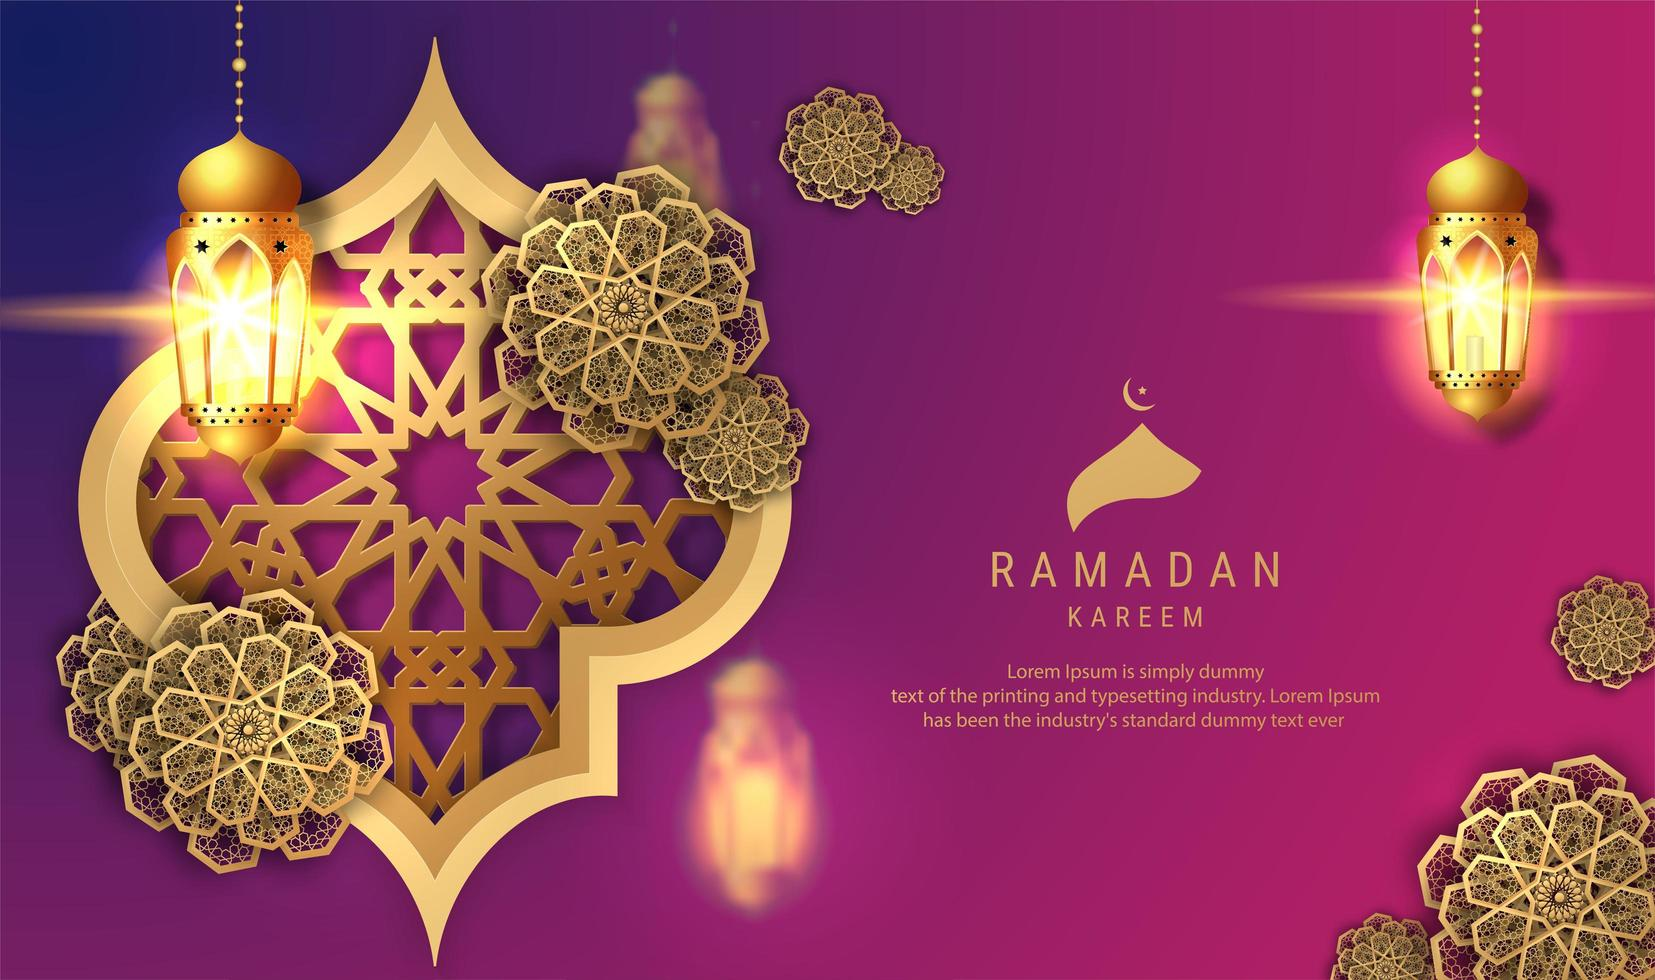 Ramadan Kareem sfondo viola con lanterne appese vettore